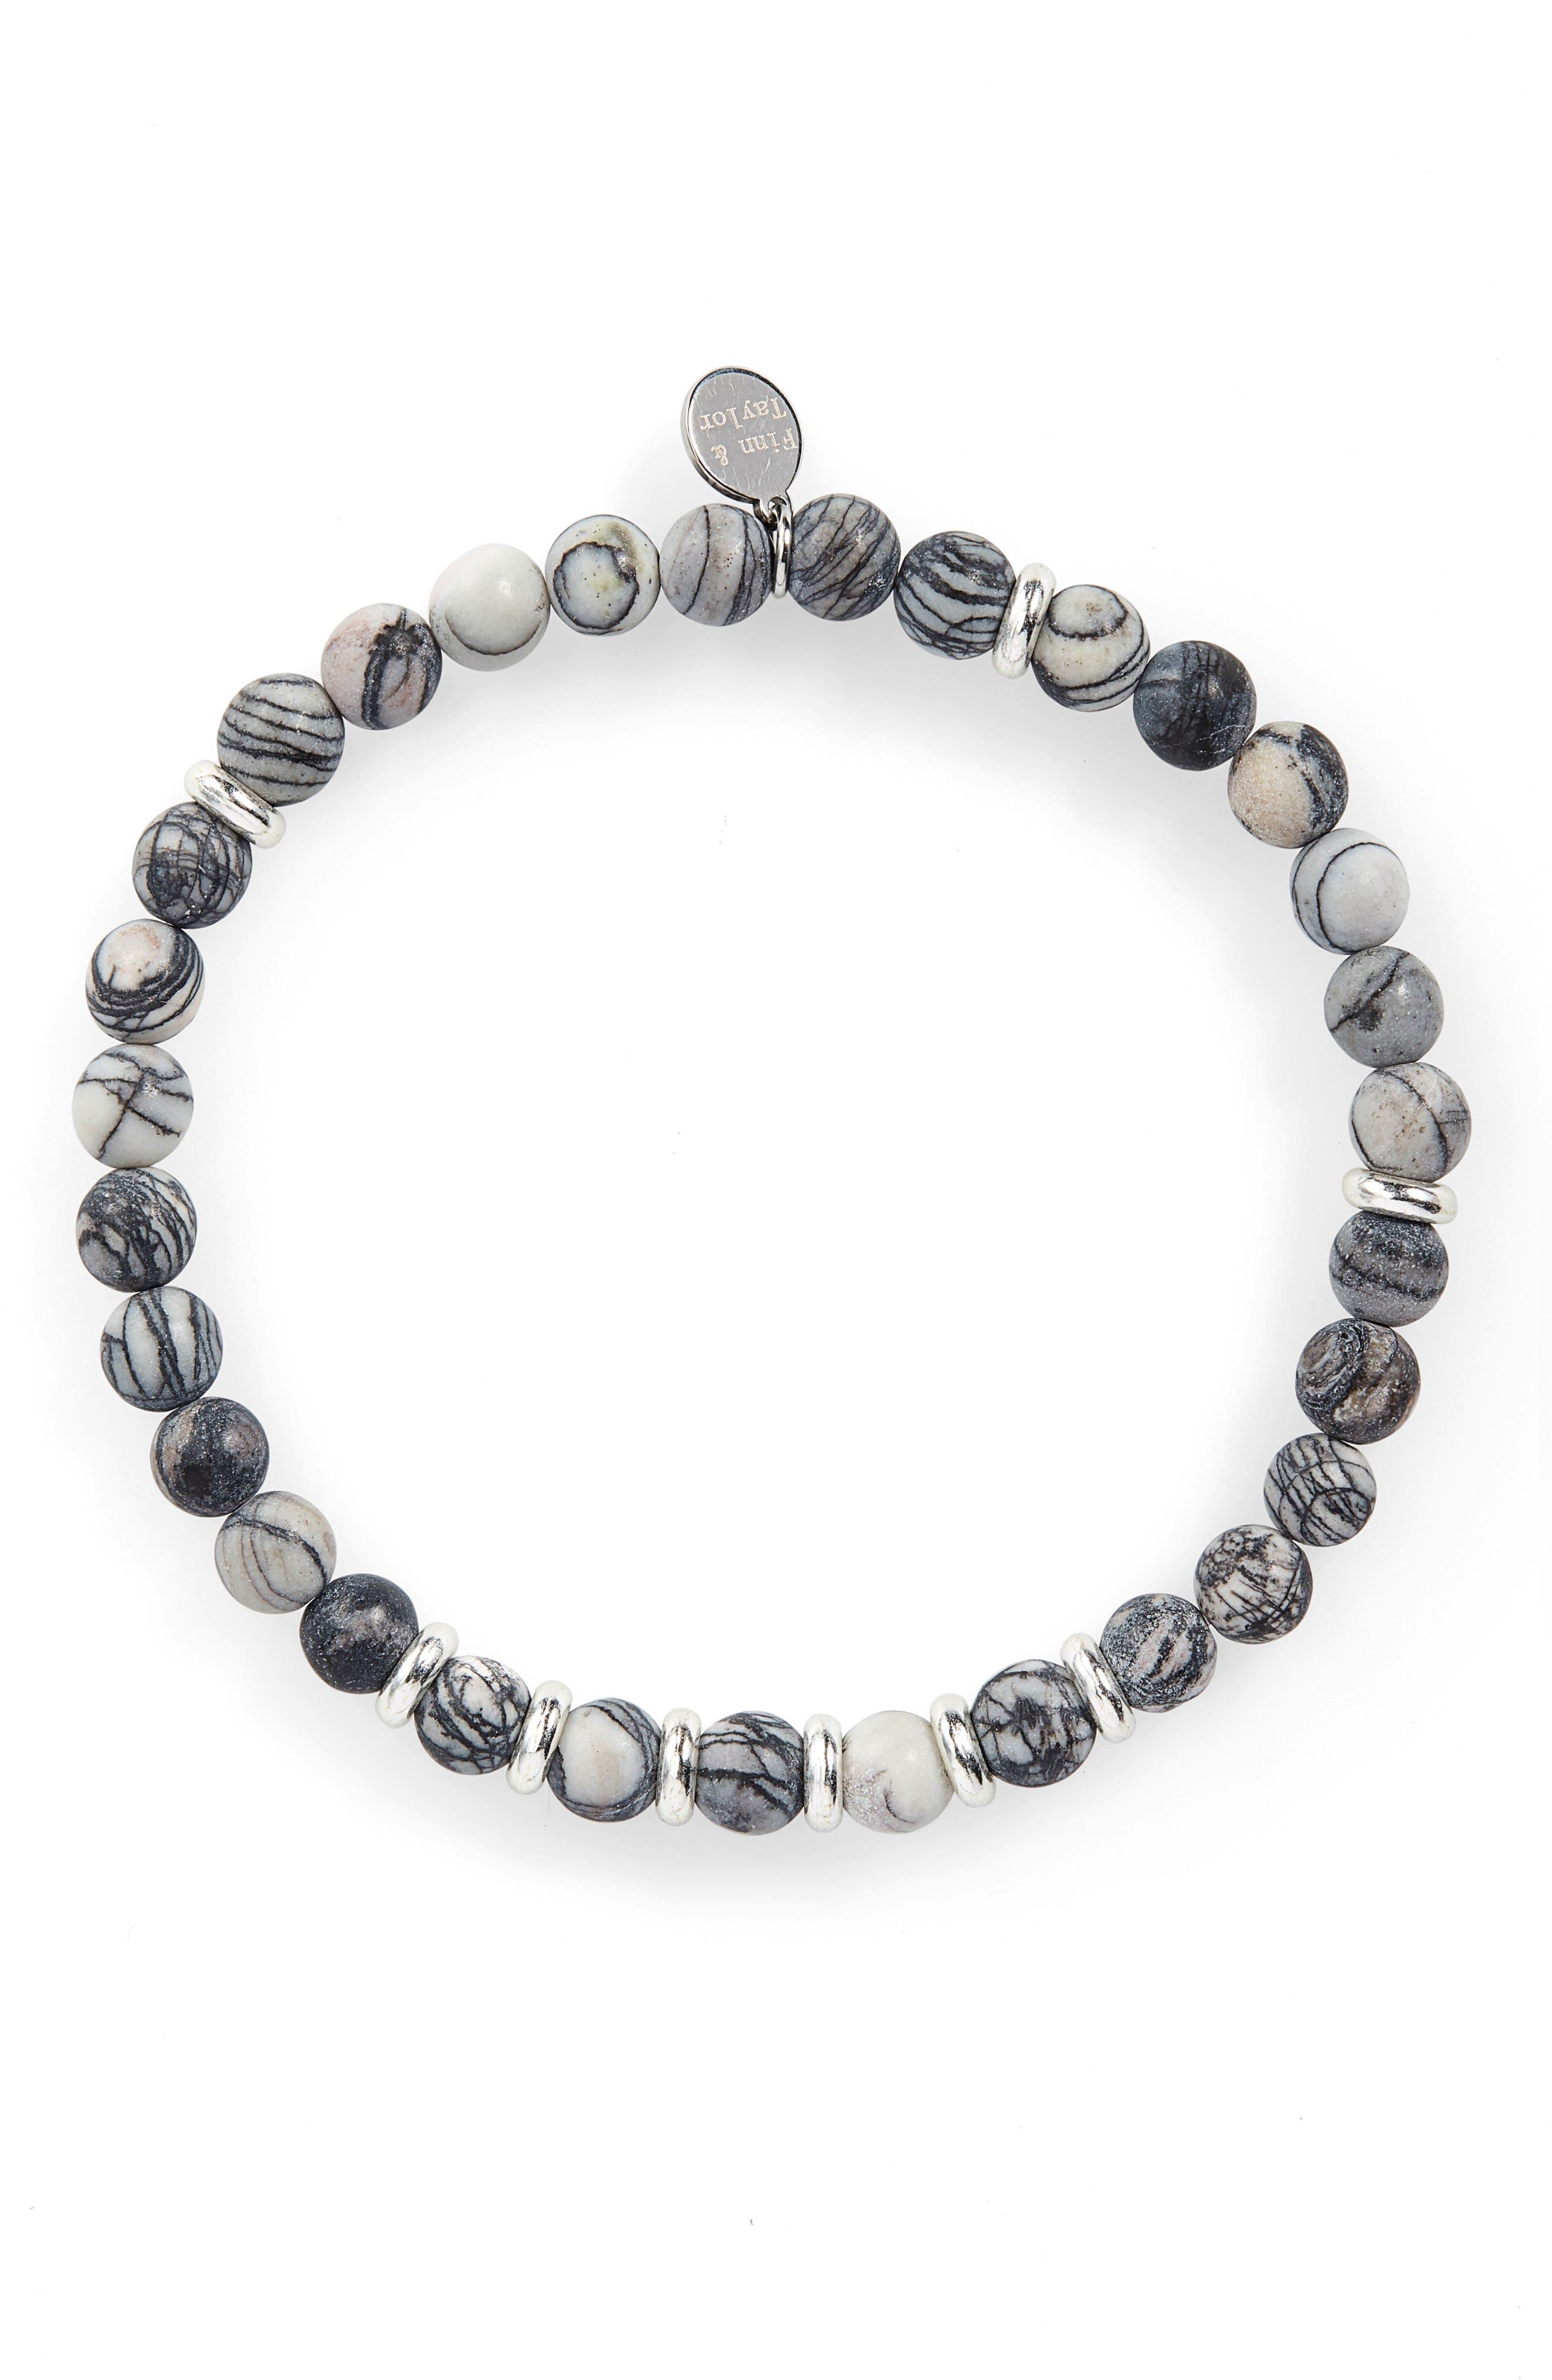 Zebra Agate Bead Bracelet,                             Main thumbnail 1, color,                             050